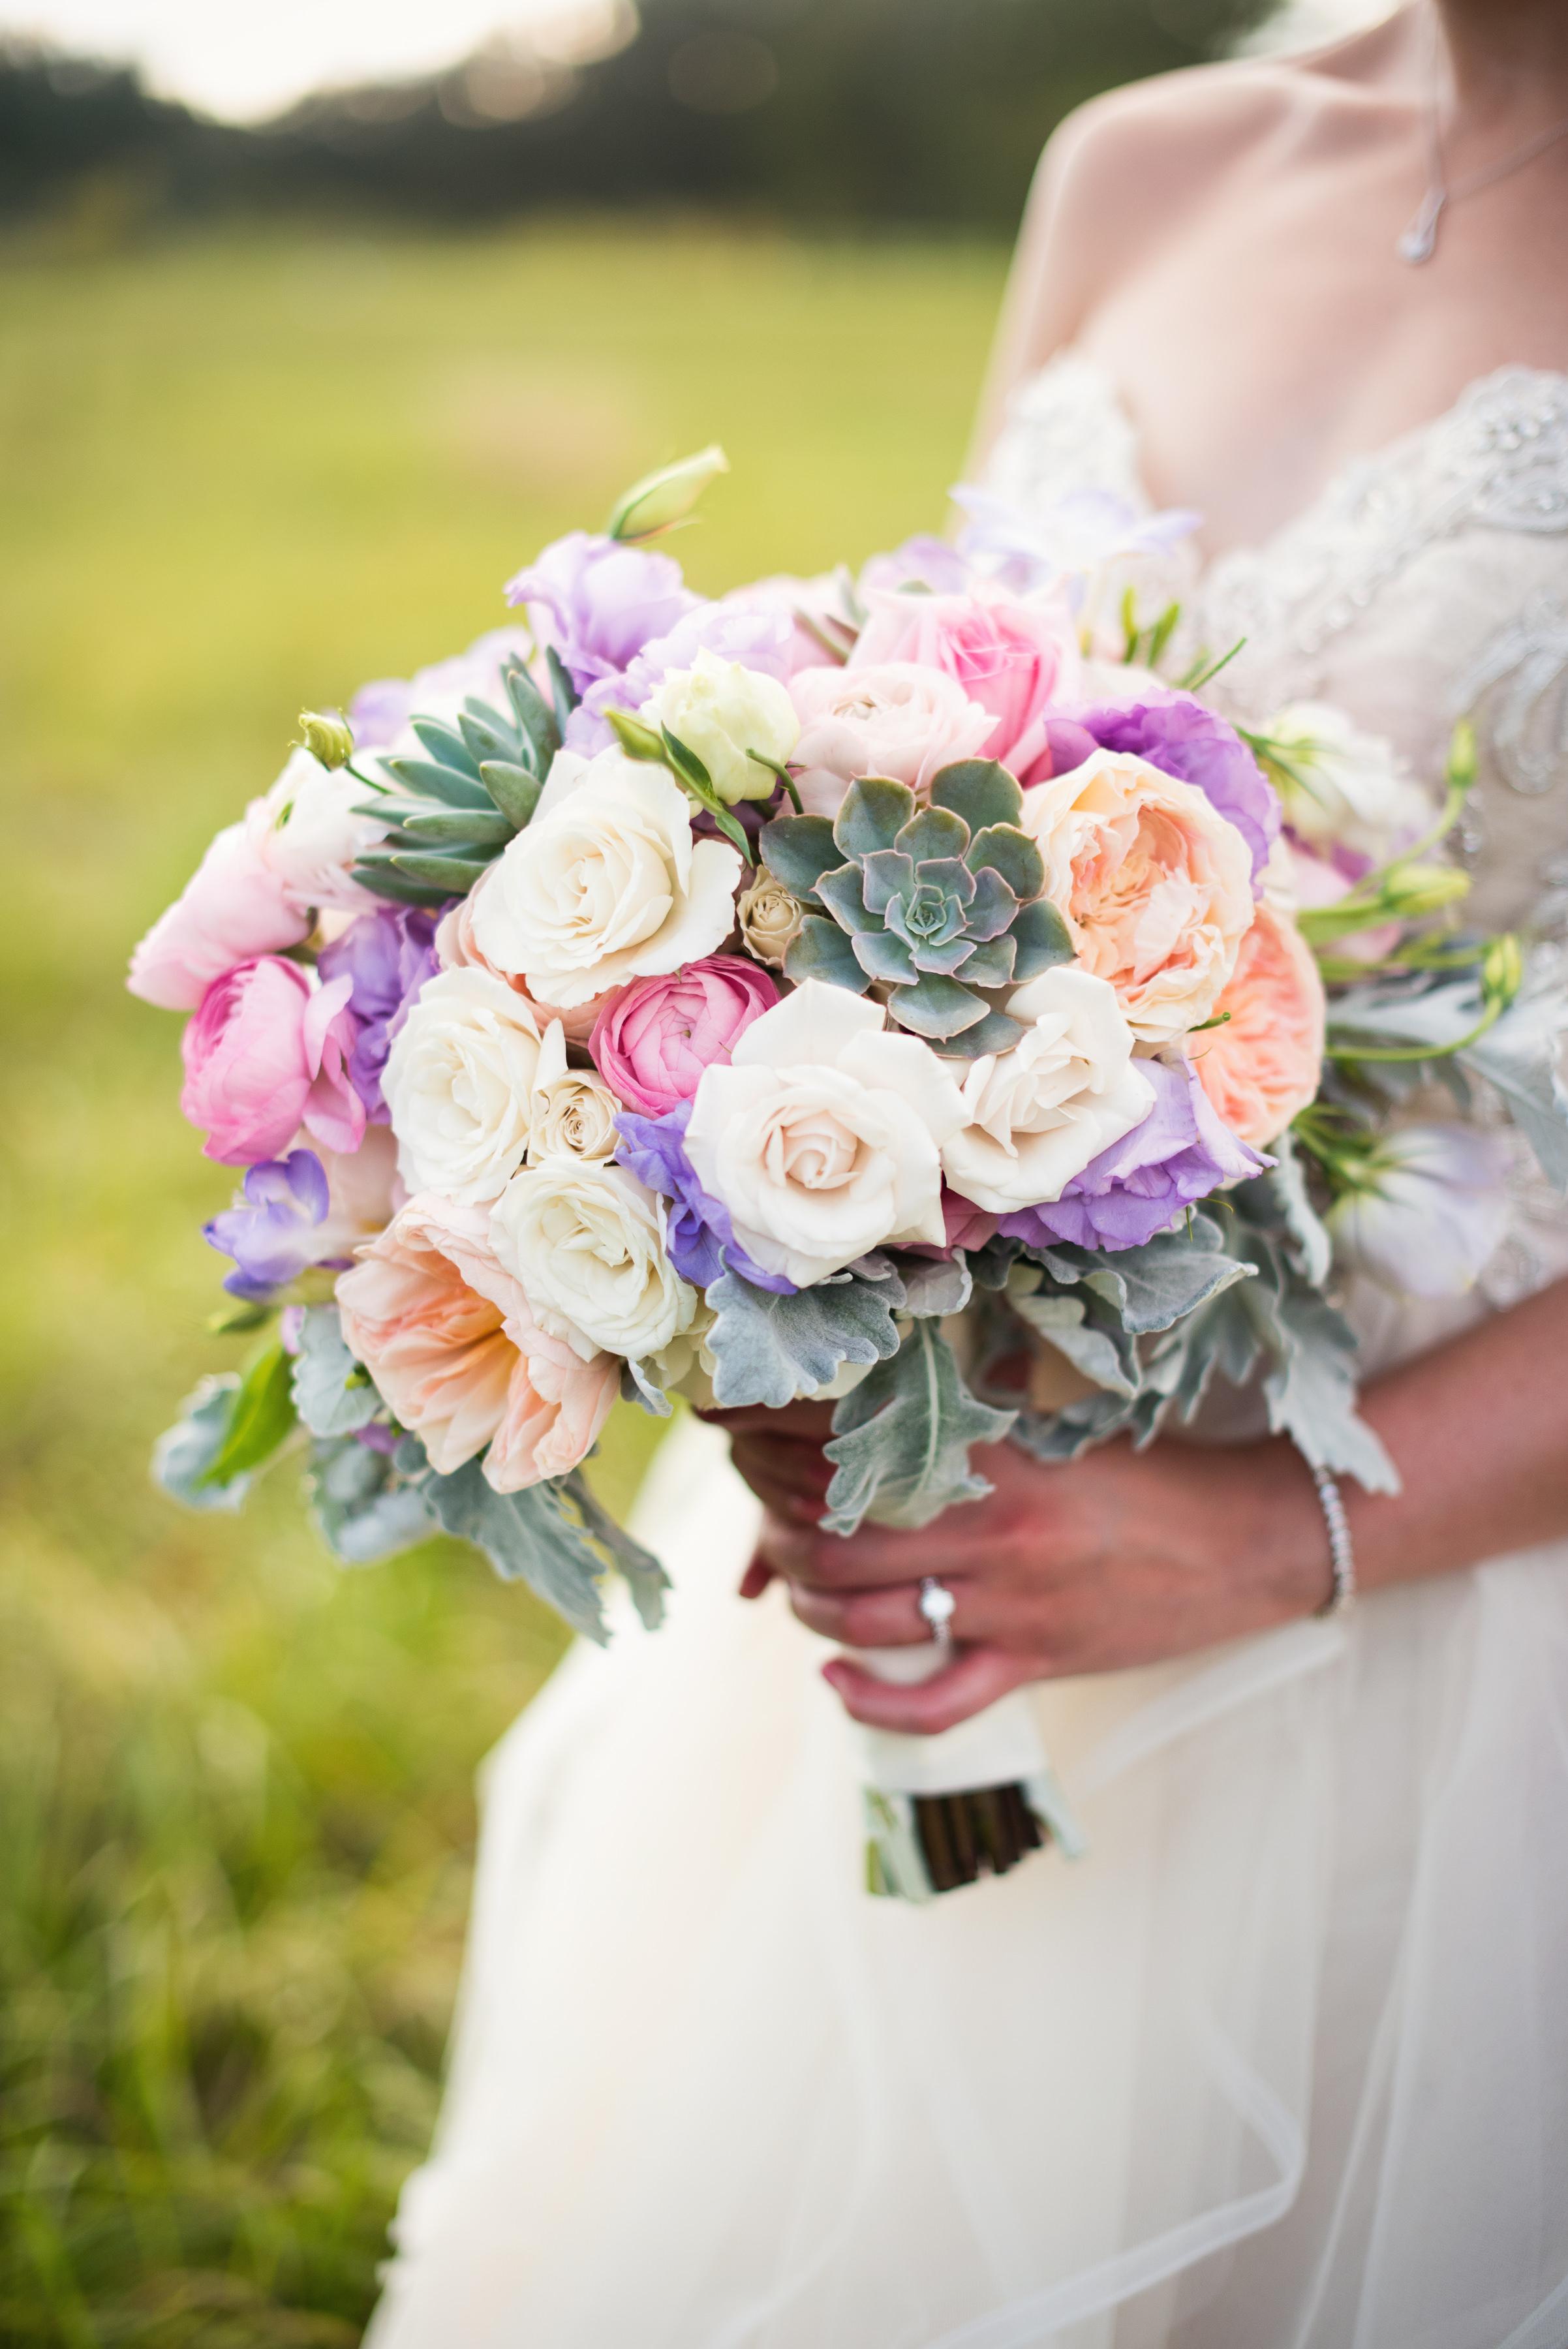 151010-Falcon-Wedding-4528-Edit